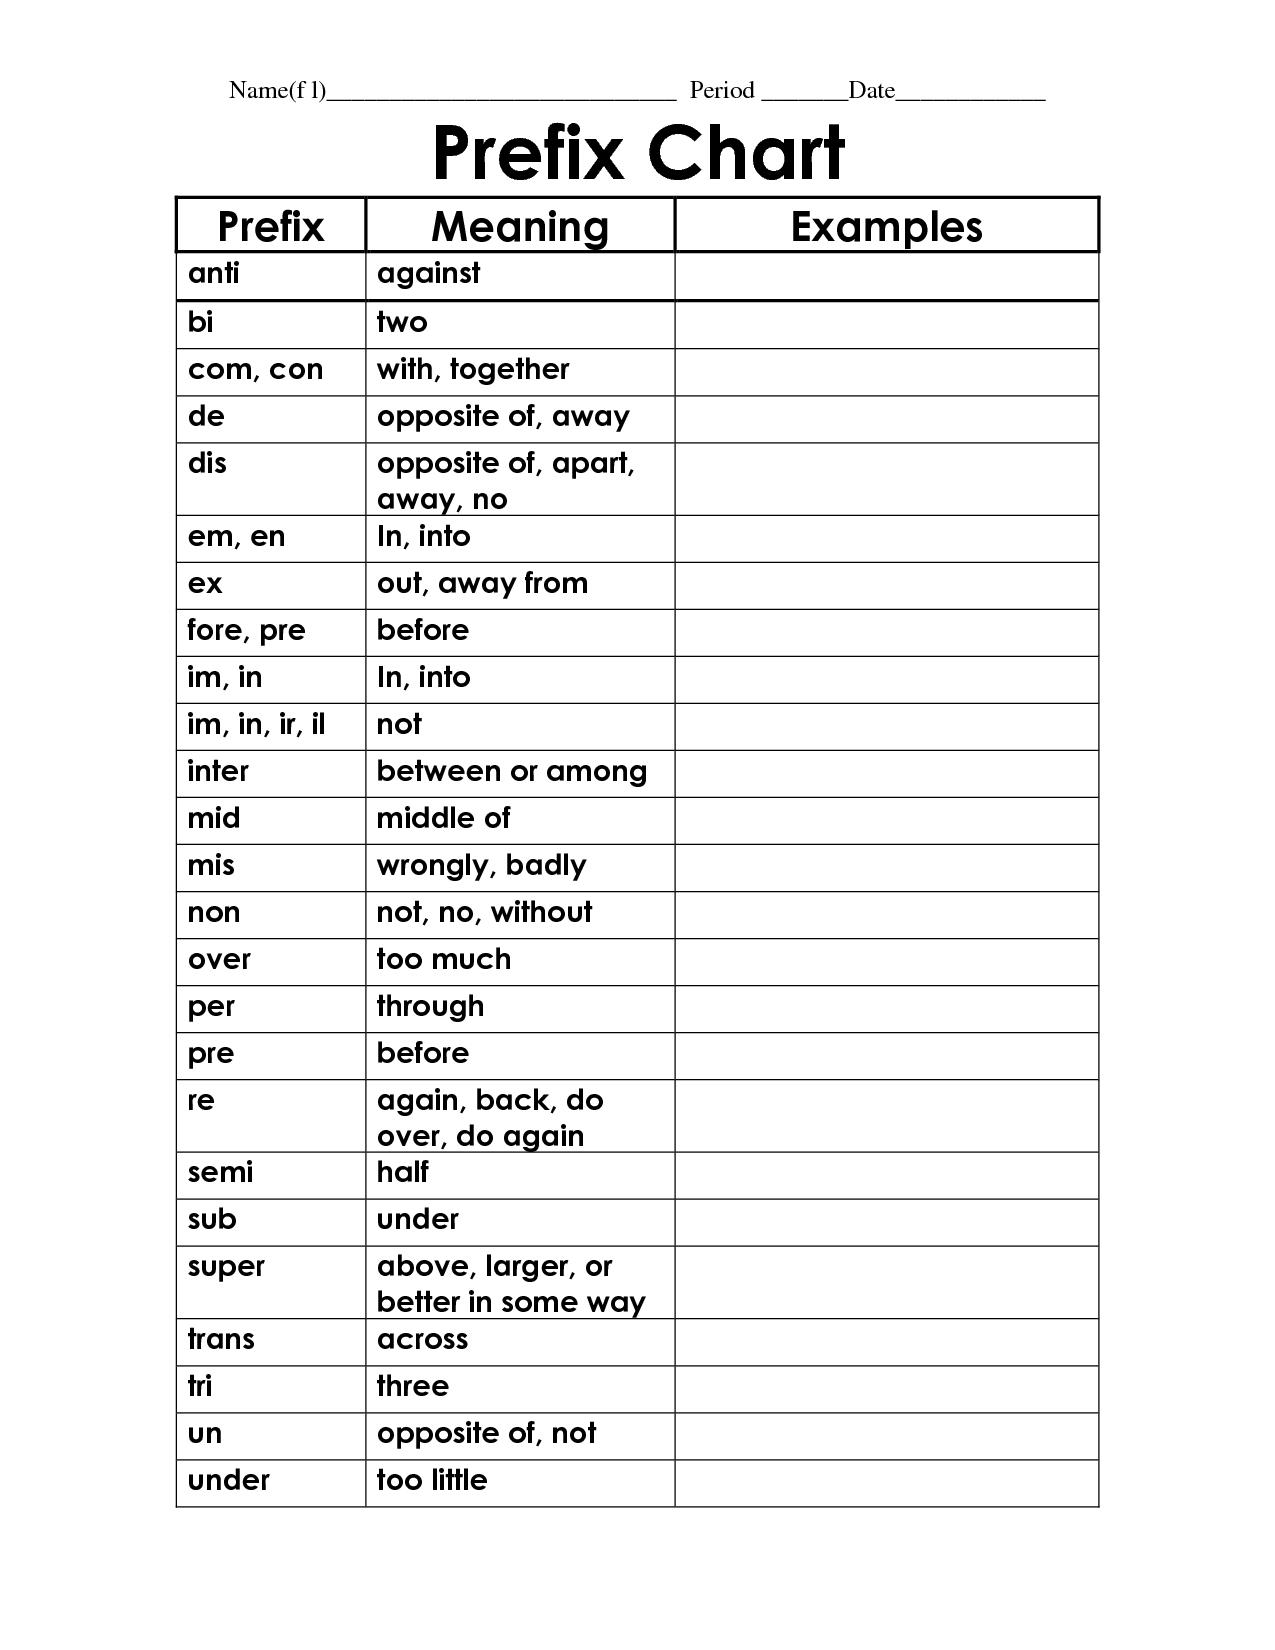 hight resolution of prefix anchor chart printable   Prefix Chart Name f l Period PRINT!!    Prefixes and suffixes